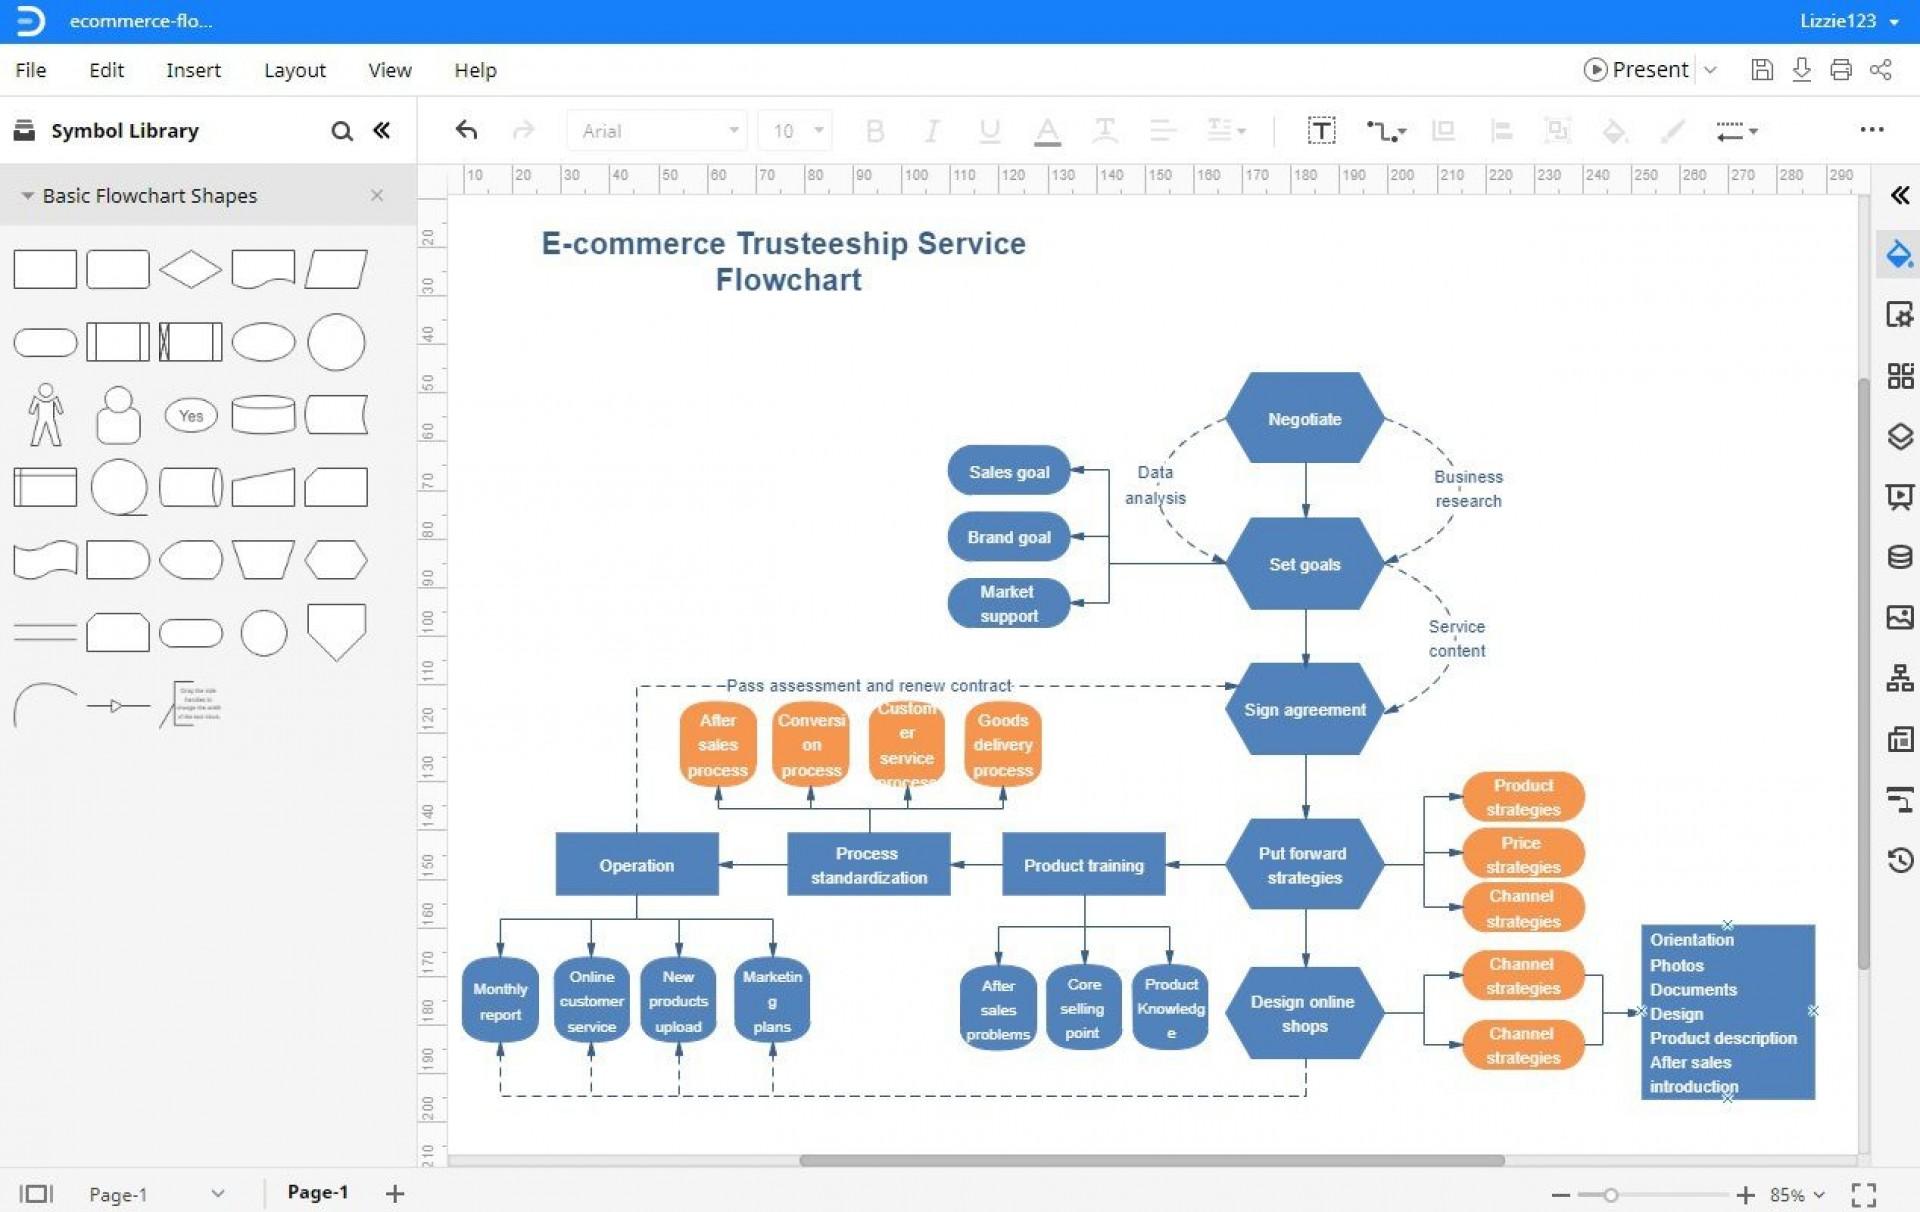 003 Striking Excel Flow Chart Template Highest Quality  Templates Basic Flowchart Microsoft Free 20101920